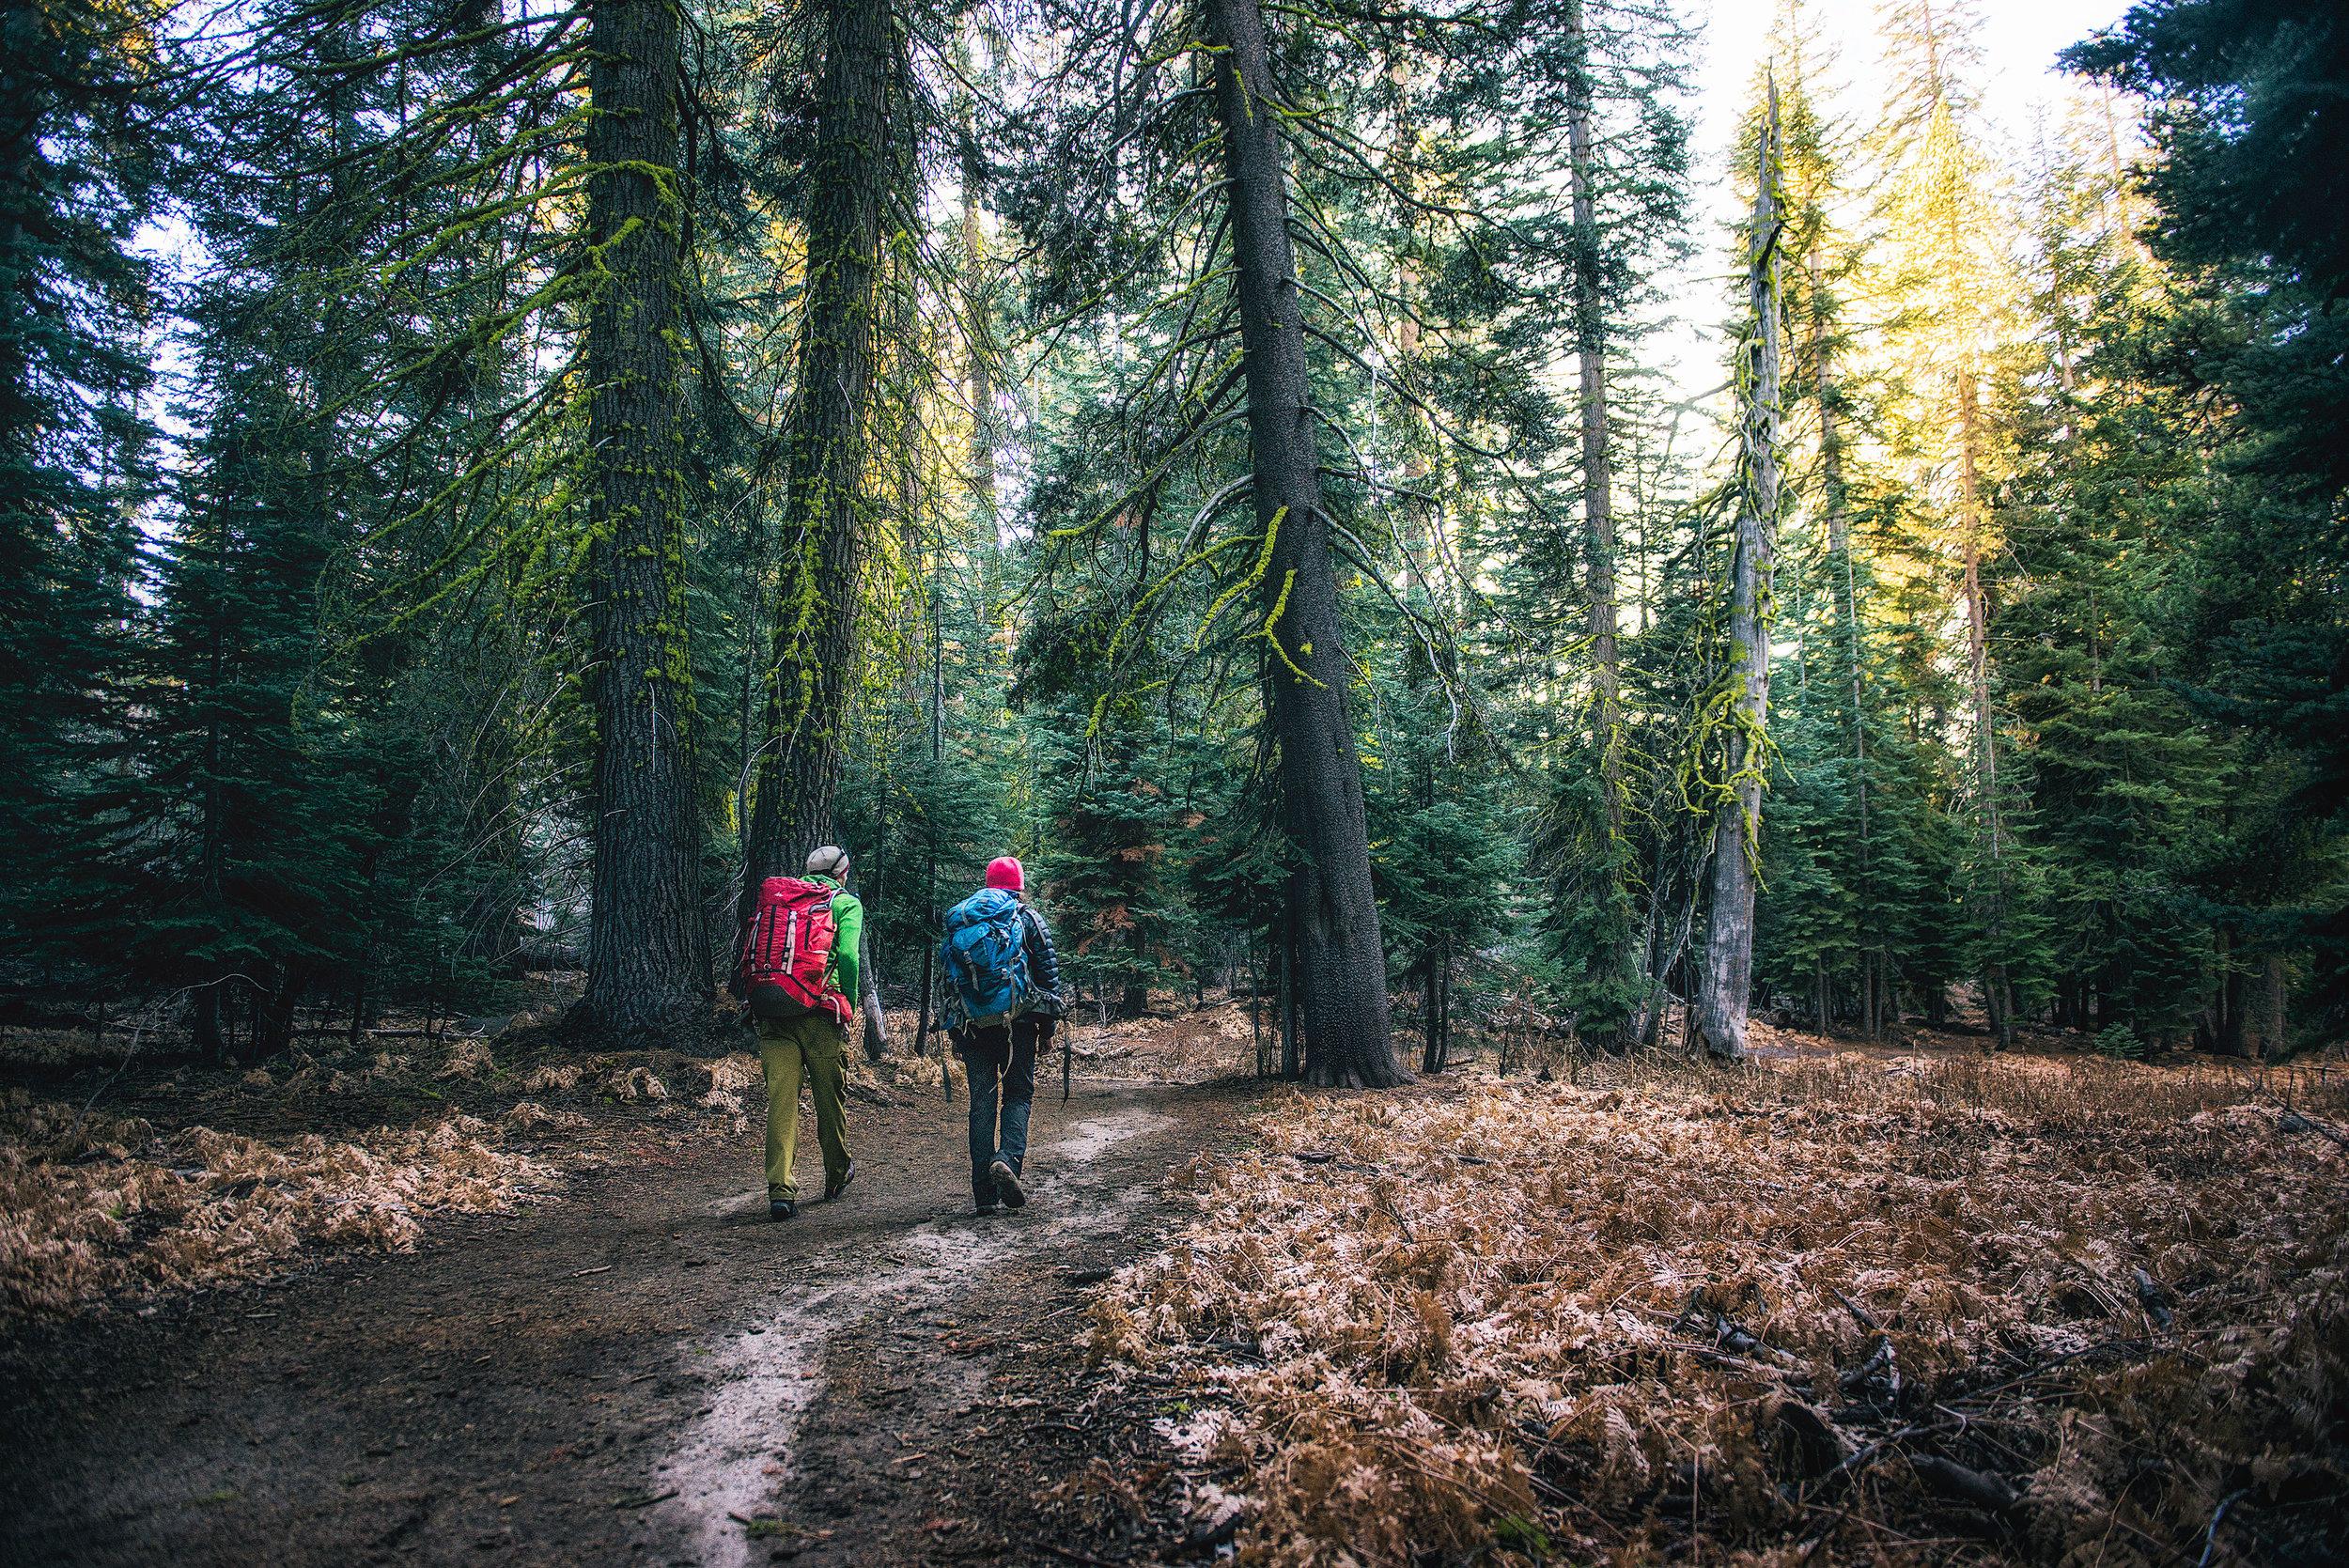 austin-trigg-wing-suit-base-jump-fly-yosemite-lifestyle-california-adventure-thrill-seeking-forest-hike.jpg